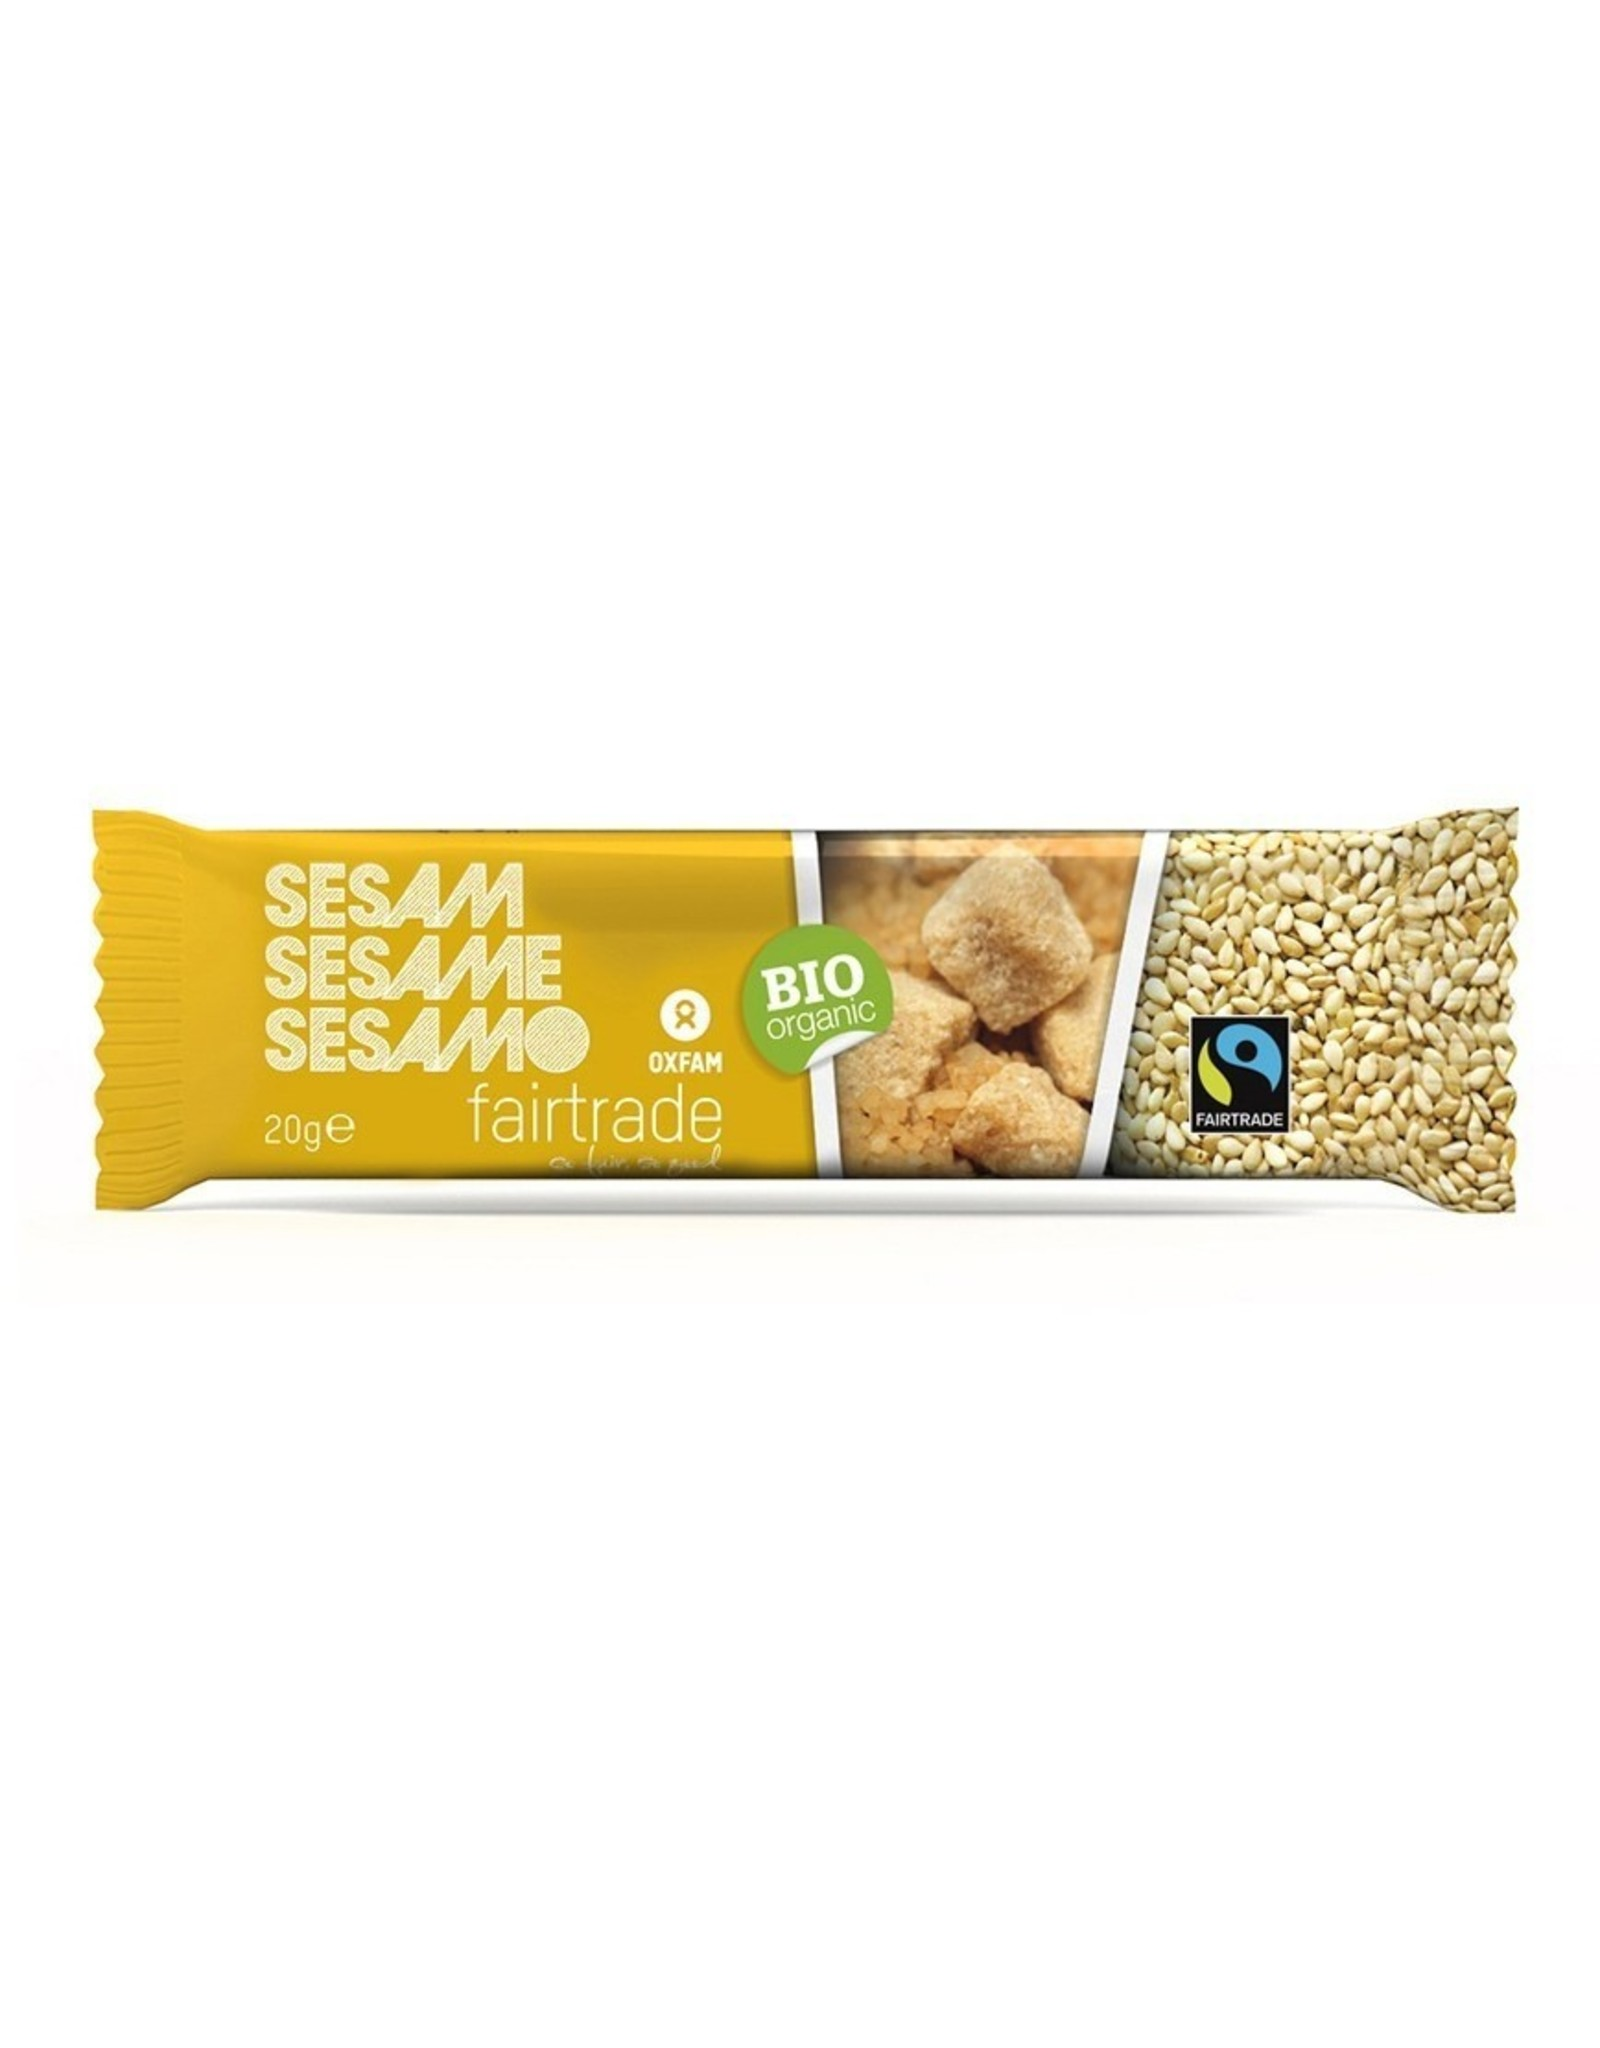 Oxfam Oxfam Sesame Seed Bar (20g)